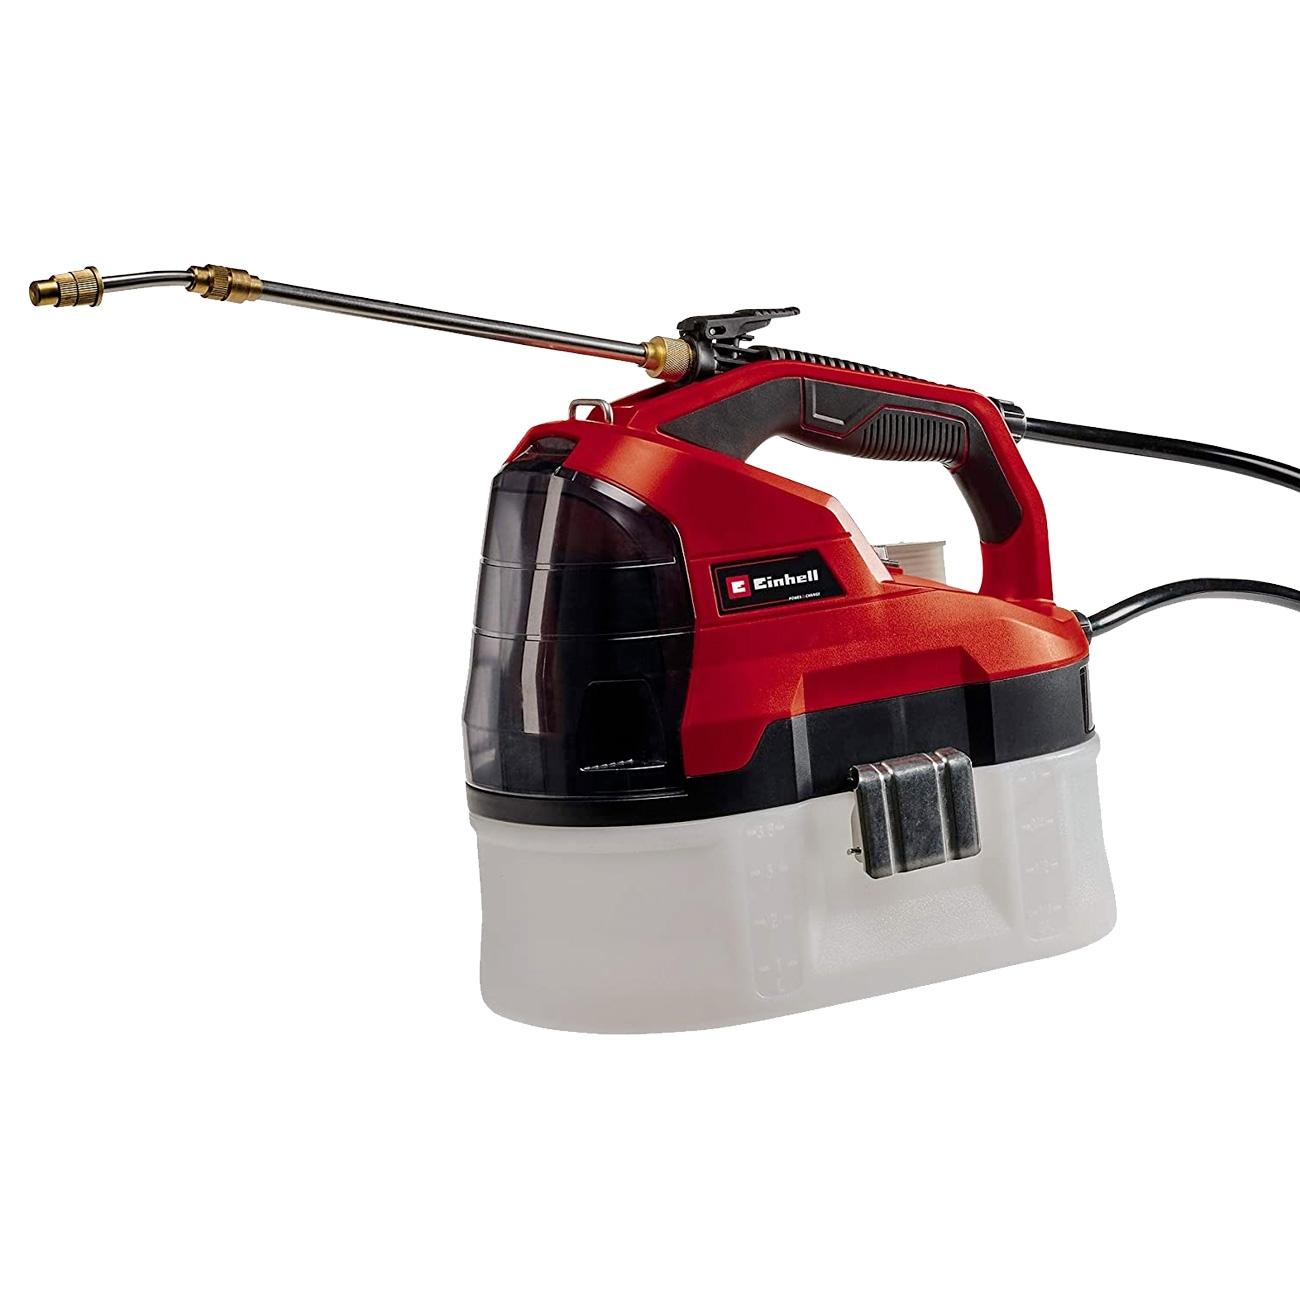 Nebulizador alimentado por batería Einhell GE-WS 18/35 Li solo